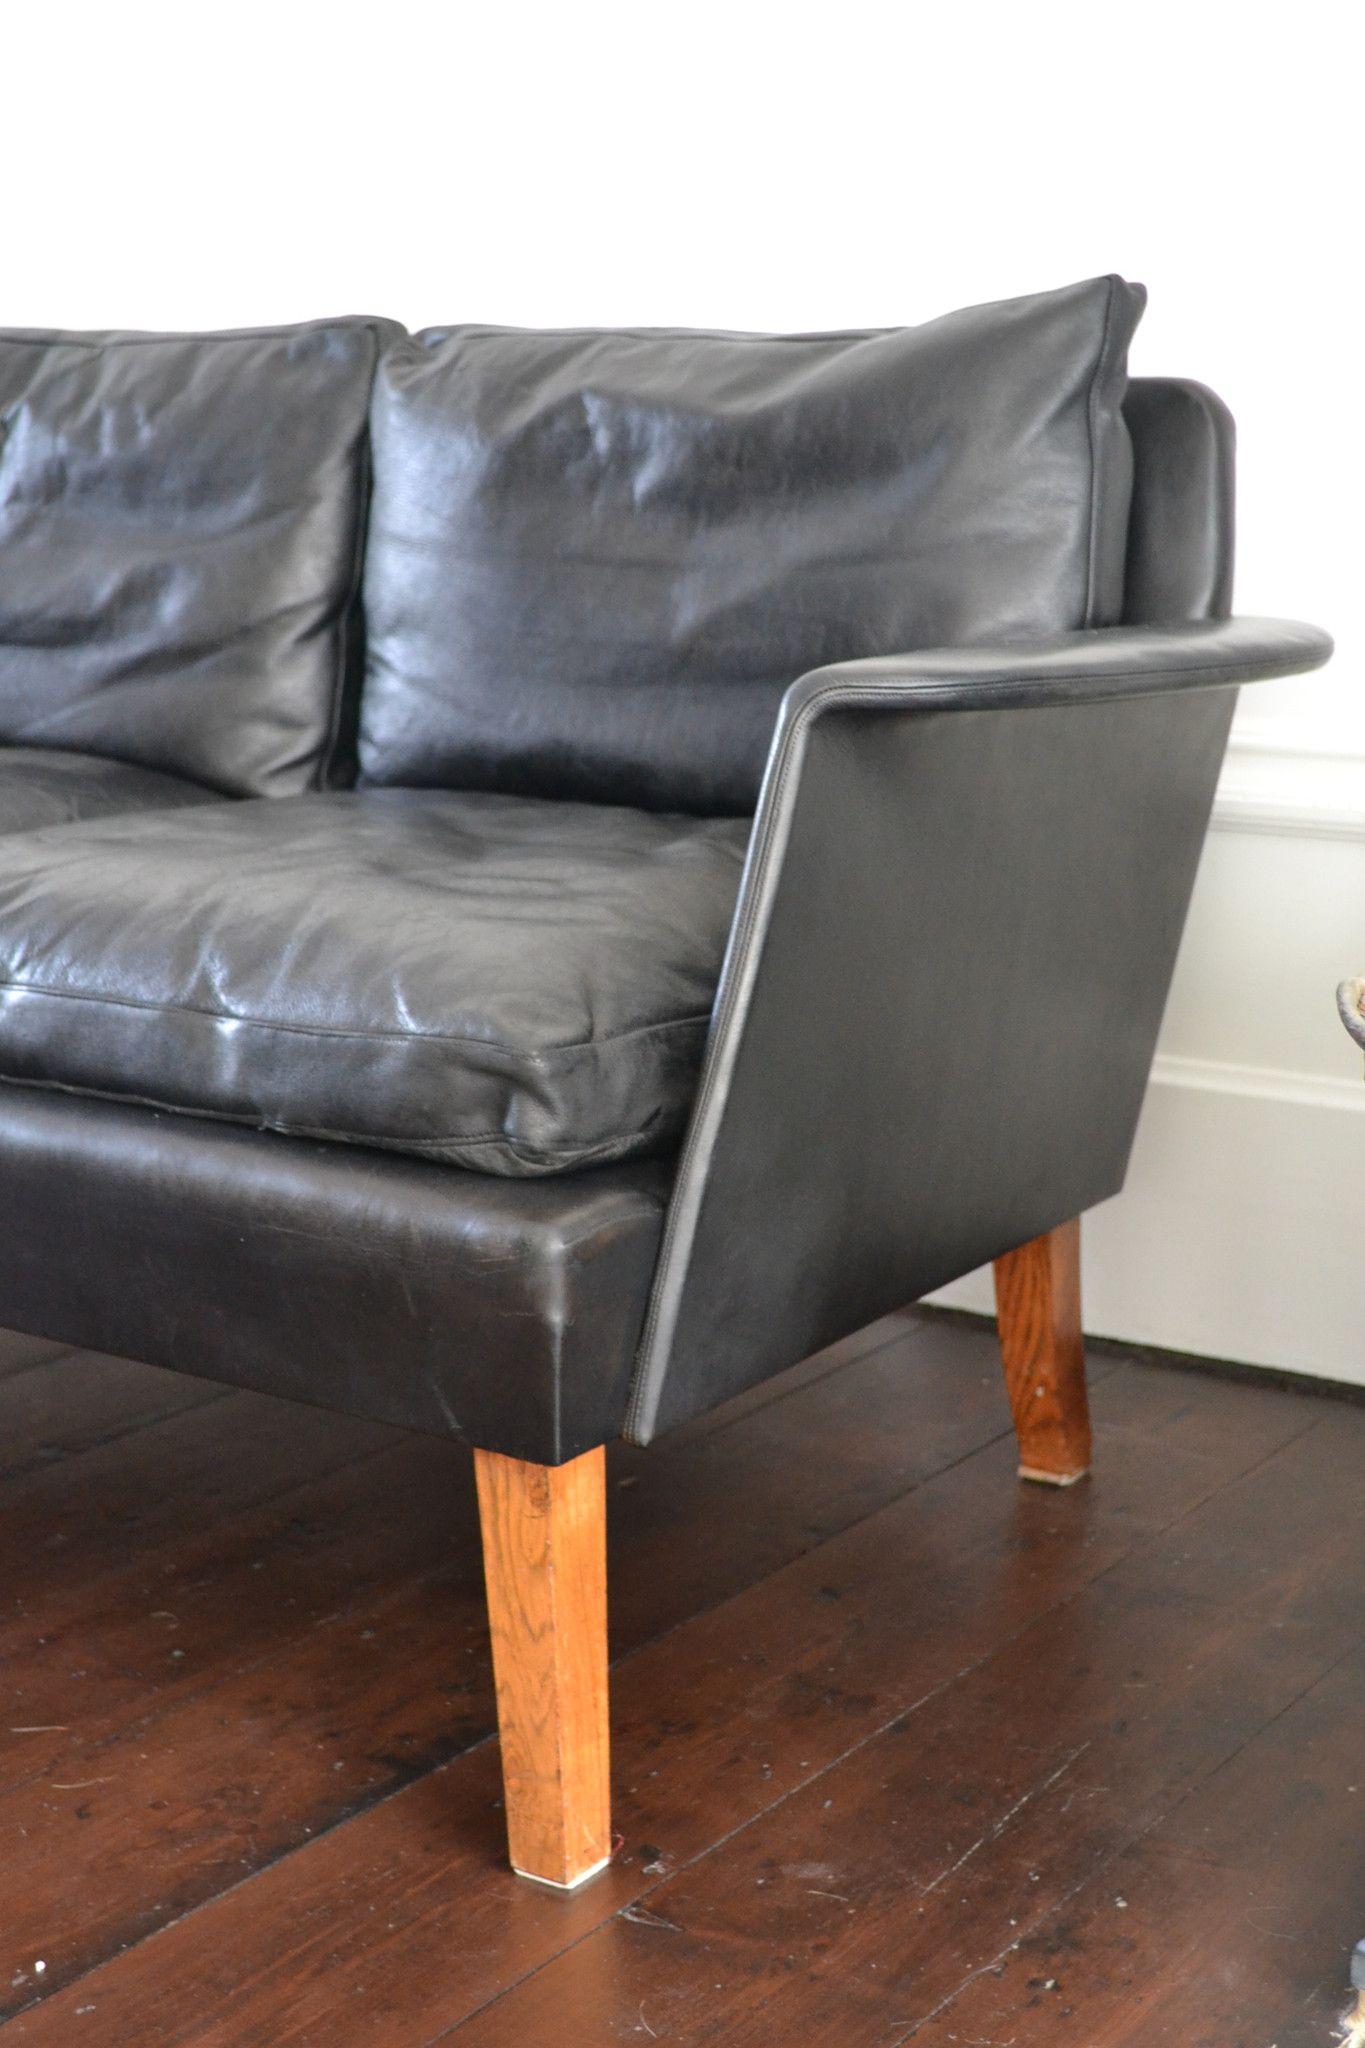 Danish Mid Century Modern Love Seat Sofa By Hans Olsen Etcetera